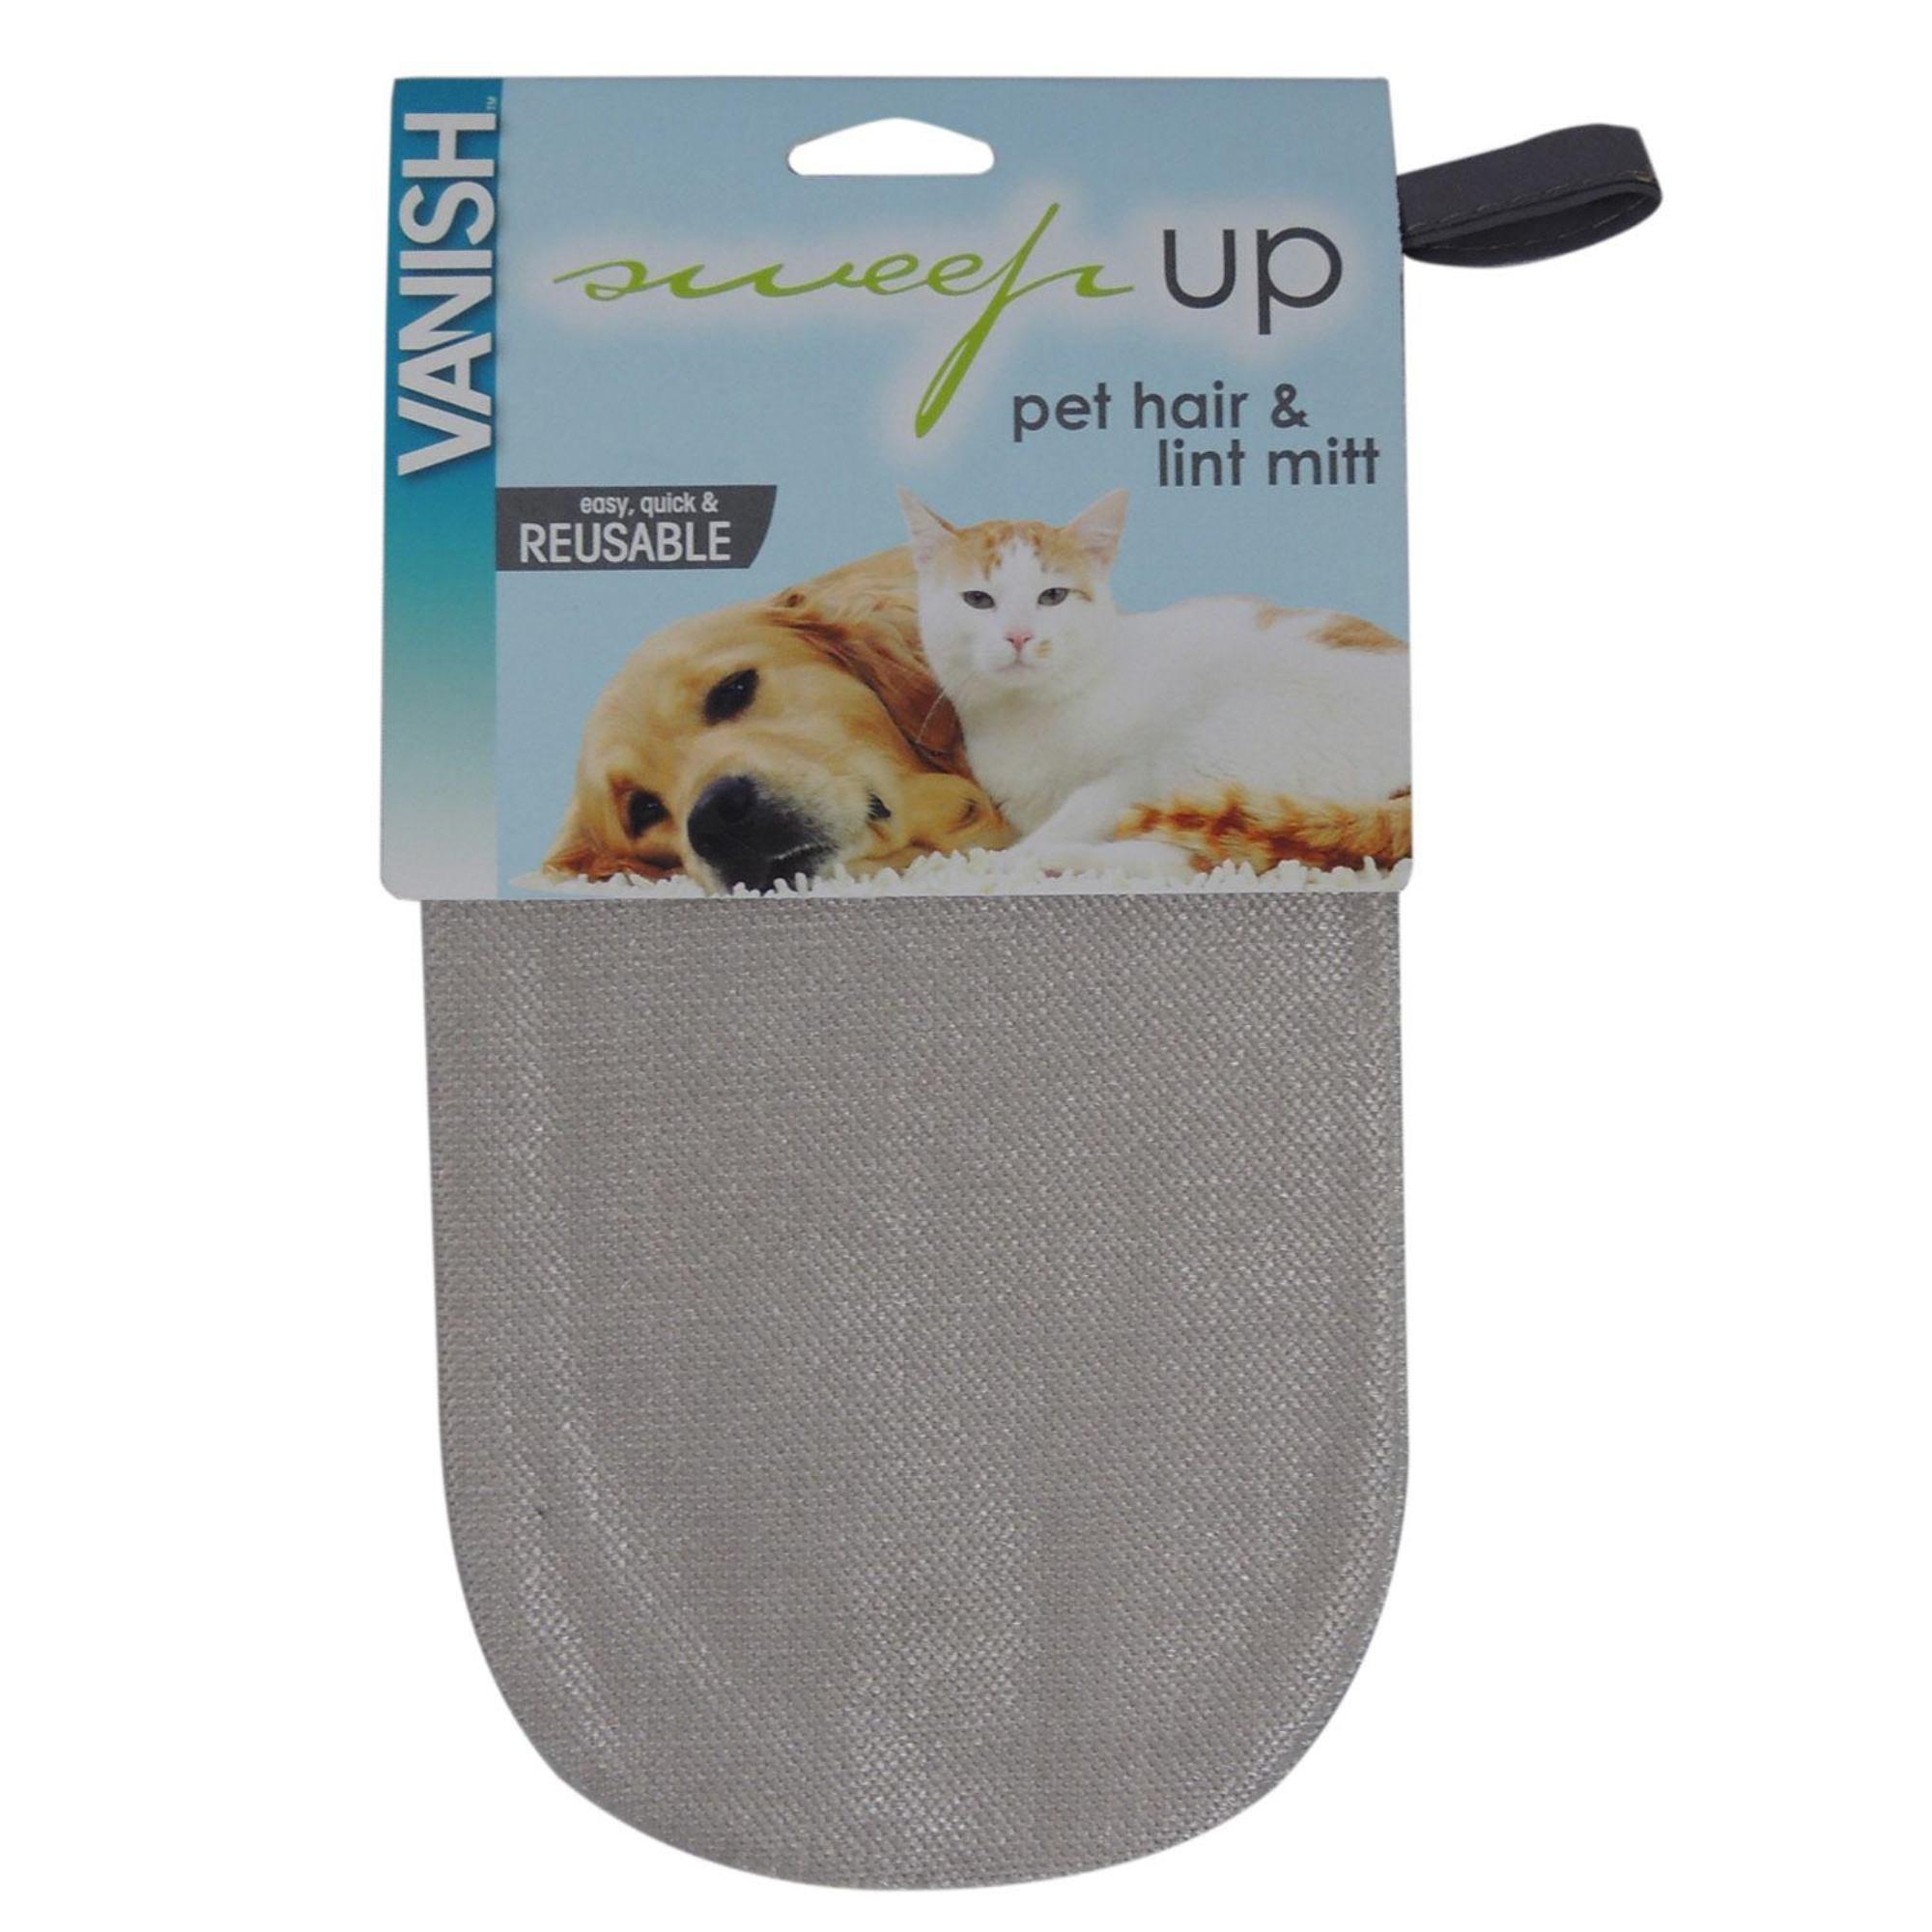 Vanish Sweep Up Pet Hair & Lint Mitt